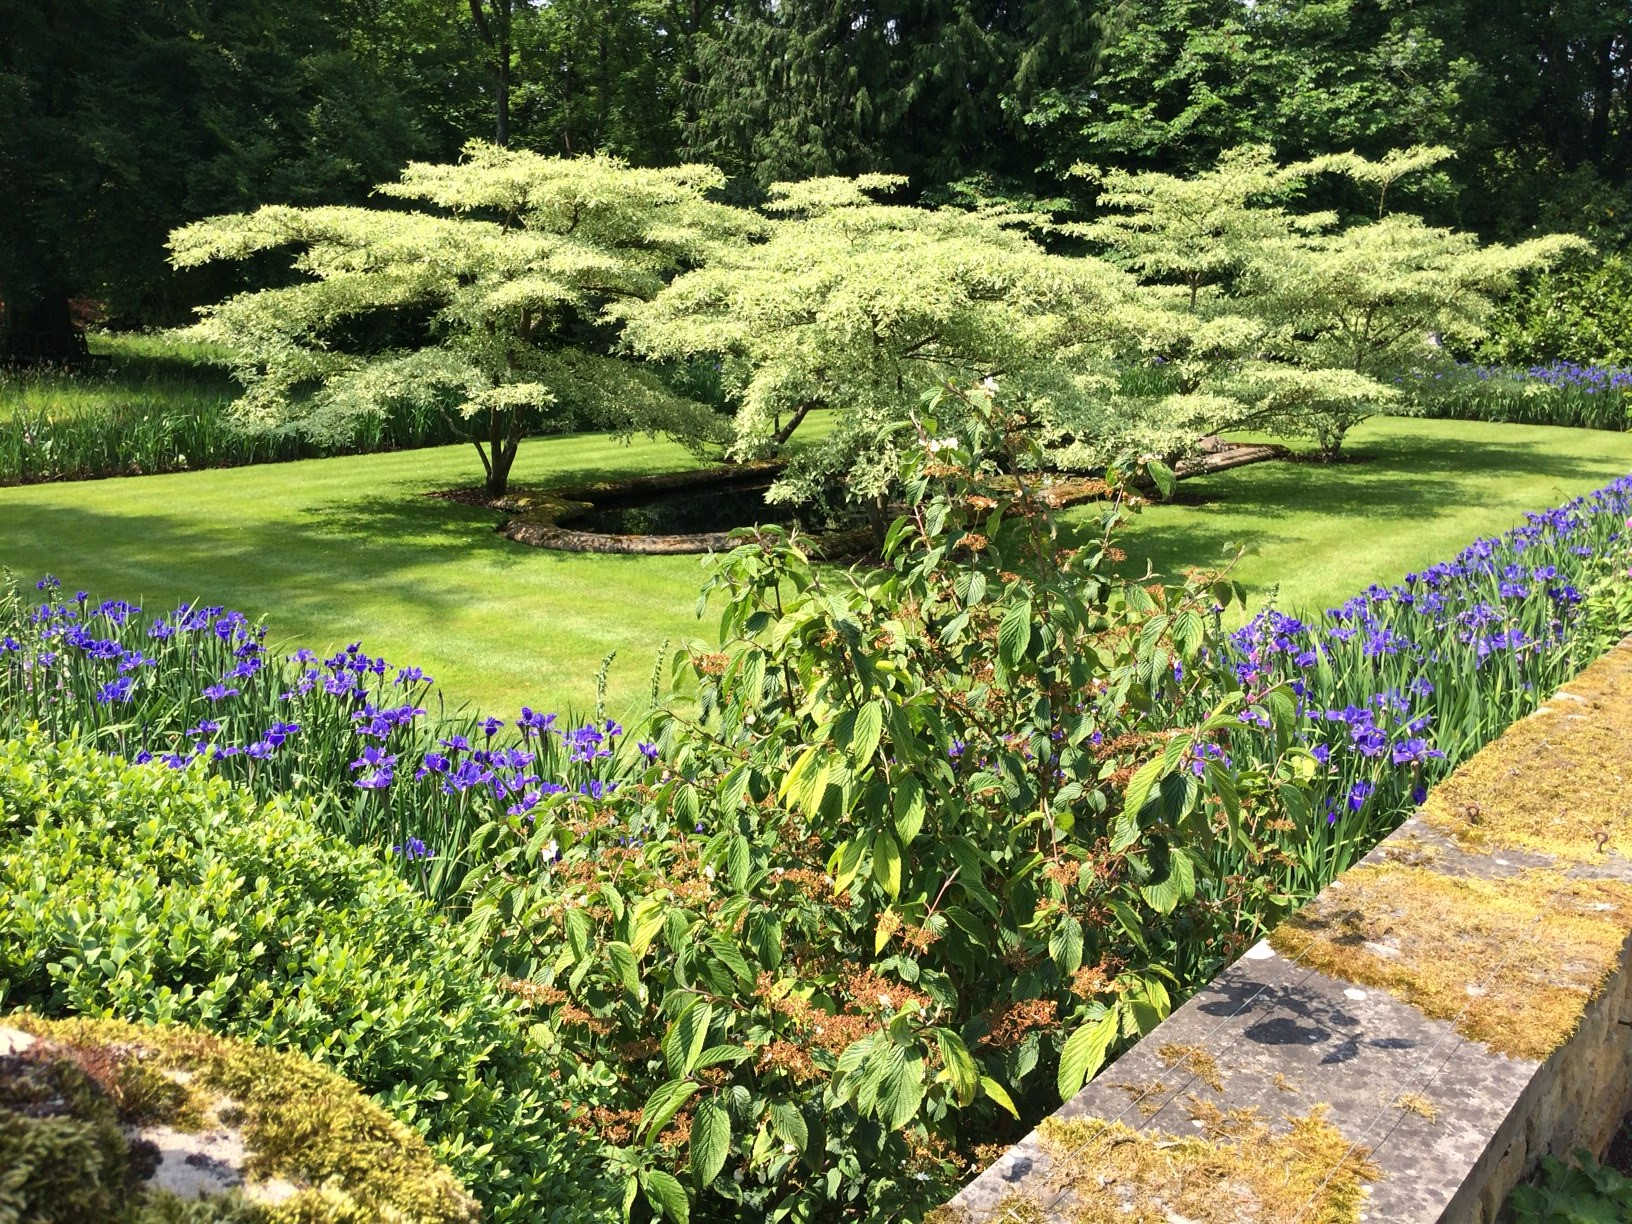 Cornus controversa variegata at Rockliffe